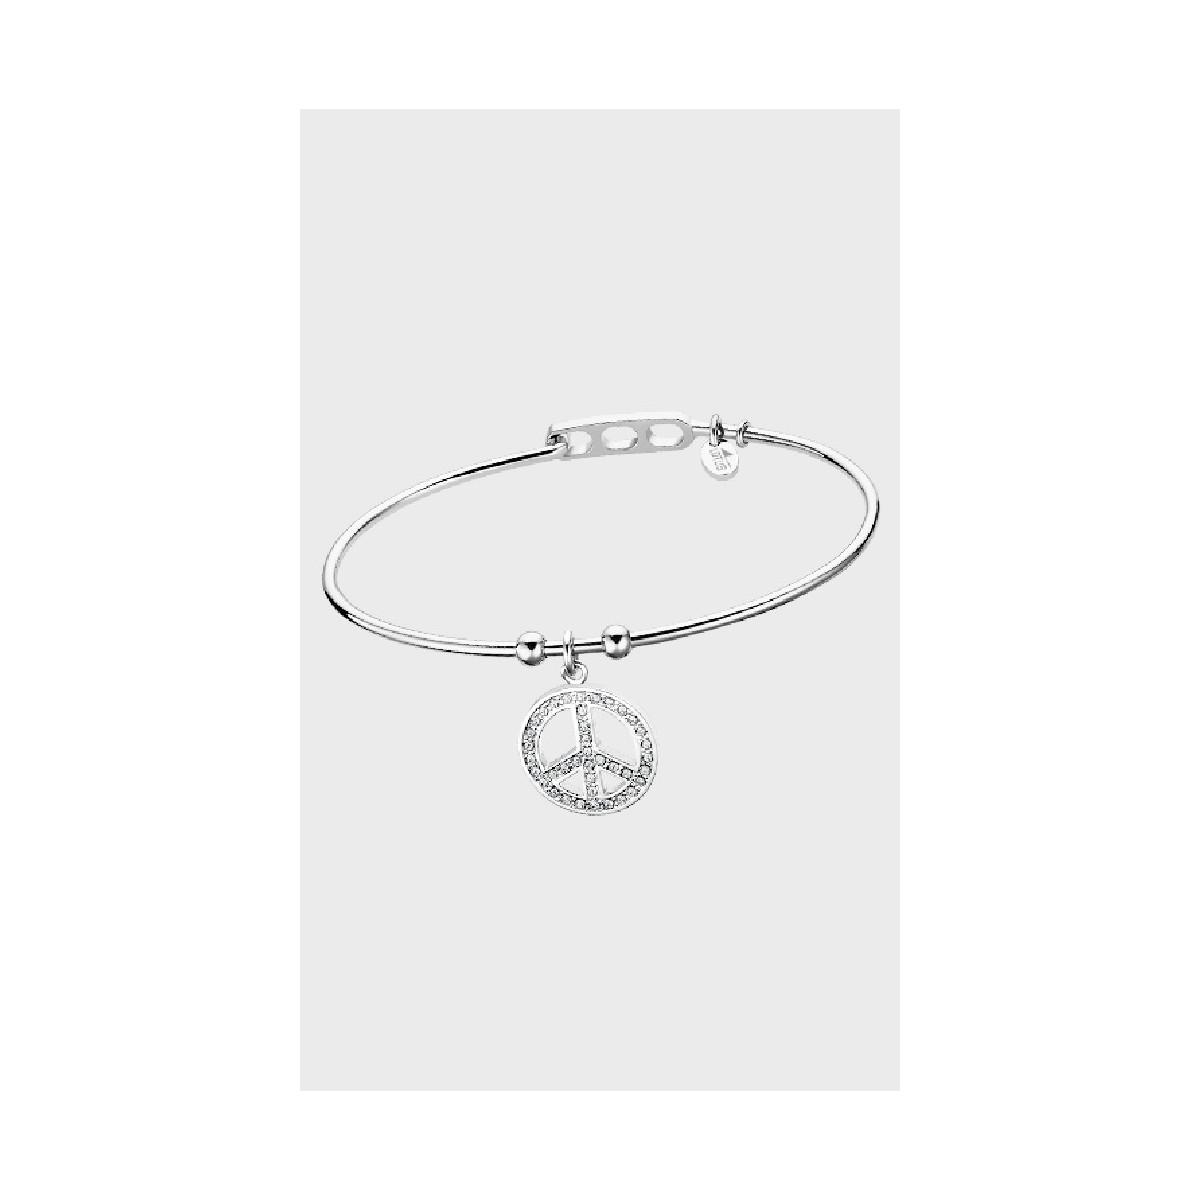 Lotus Style Pulsera Sra.ace.paz - LS2015-2/2